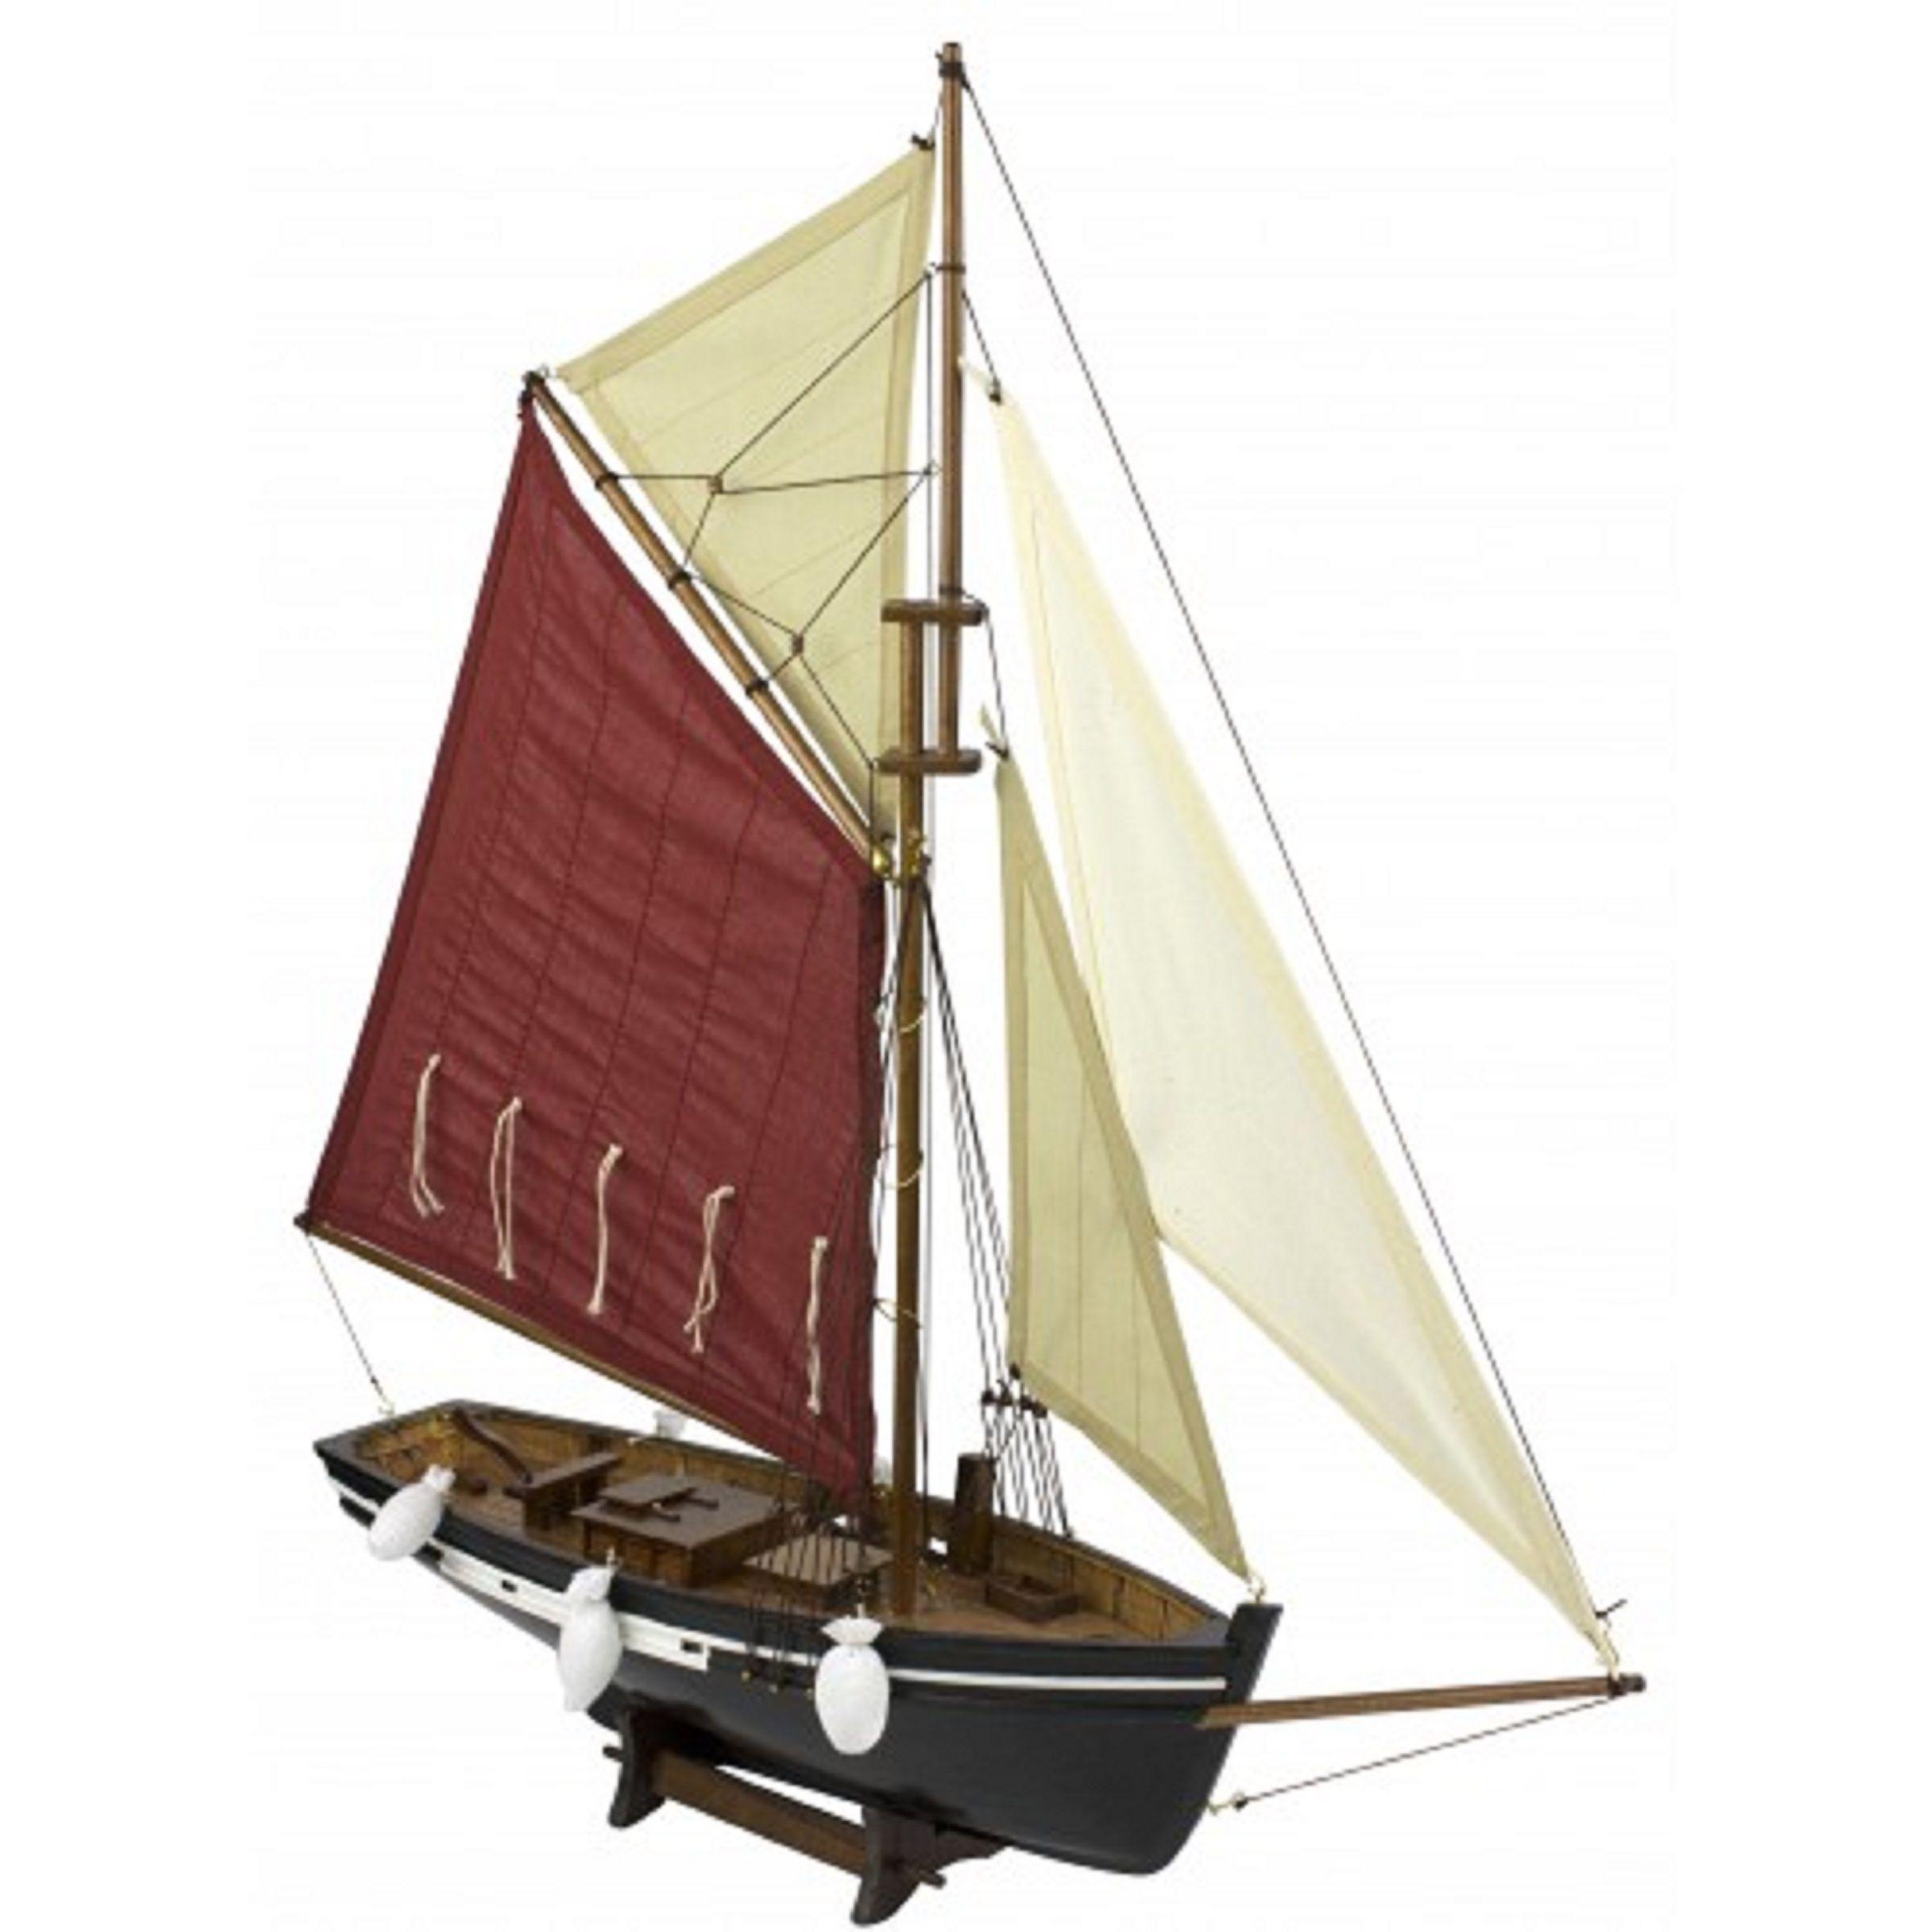 1663-9486-Gaff-Rigged-Breton-Style-Fishing-Boat-Standard-Range